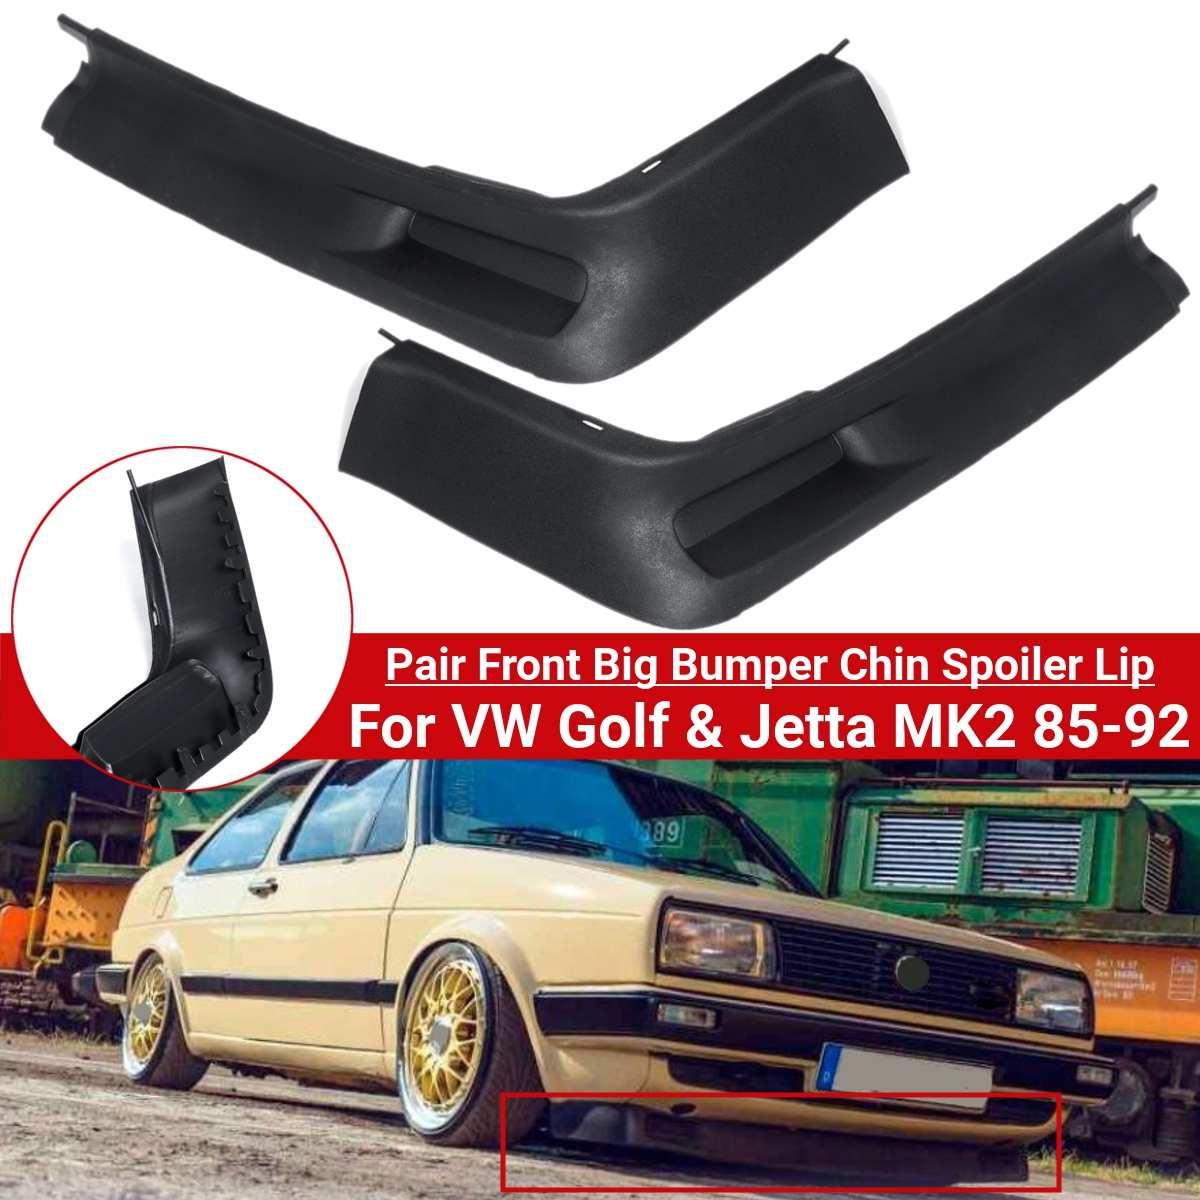 Pair Valance Splitter Front Big Bumper Chin Spoiler Lip For VW Golf For Jetta MK2 85-92 Car Exterior Parts Bumper Accessories